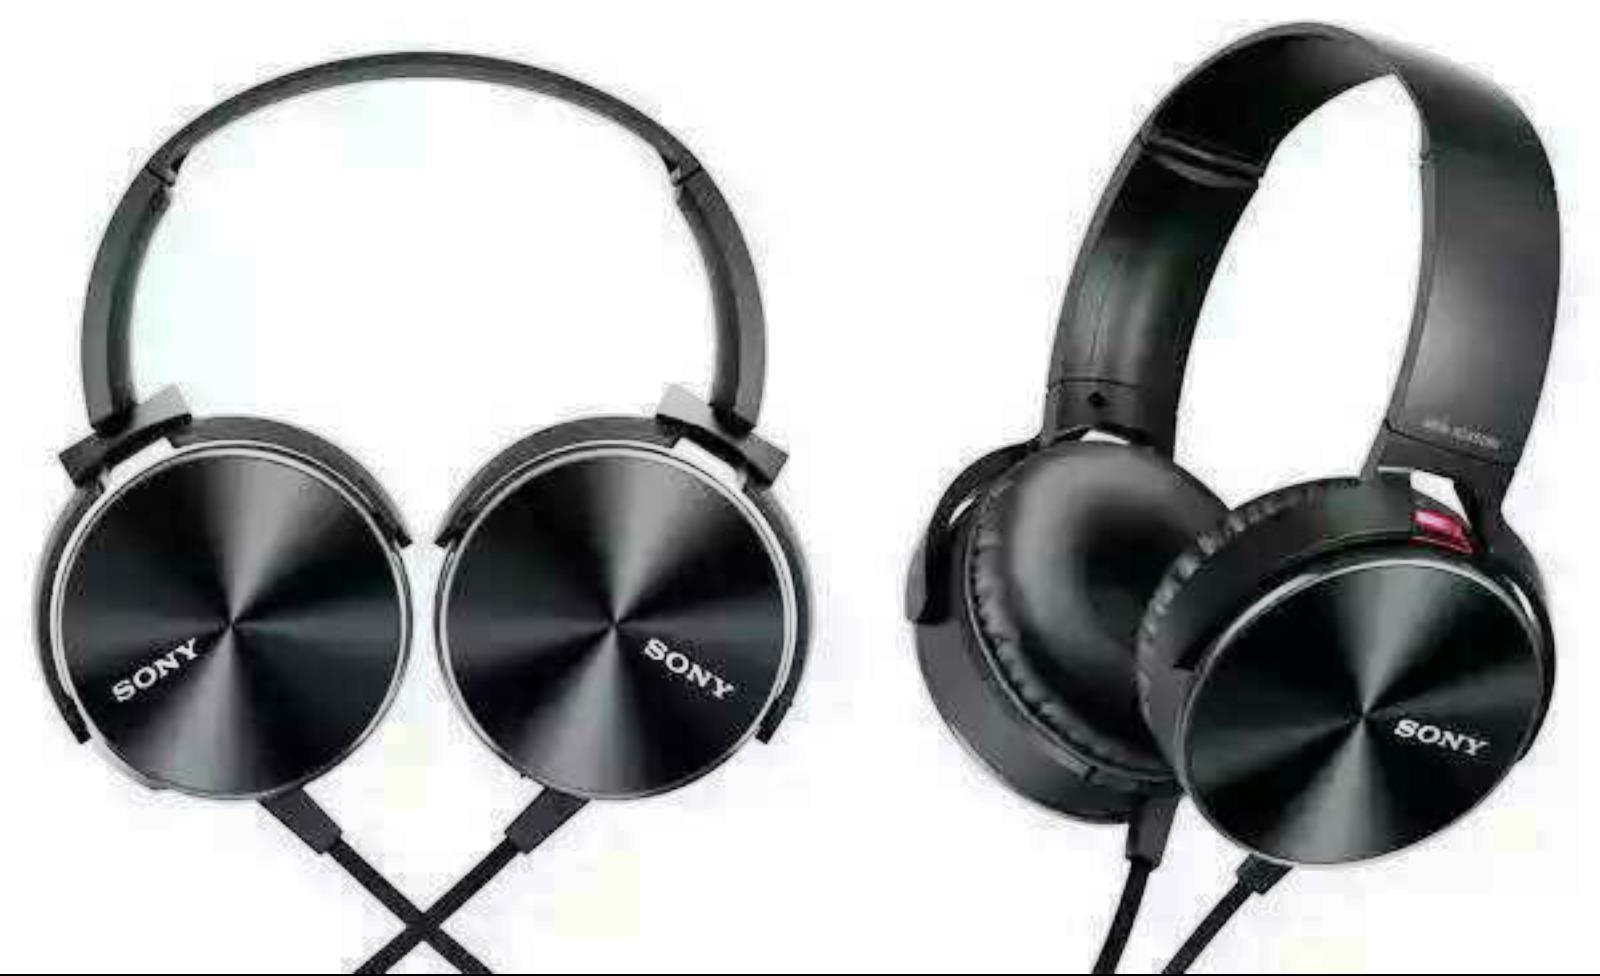 Harga Sony Headphone Extra Bass Stereo Mdr Xb450ap Headset Headphones End 9 15 2016 715 Pm Xb